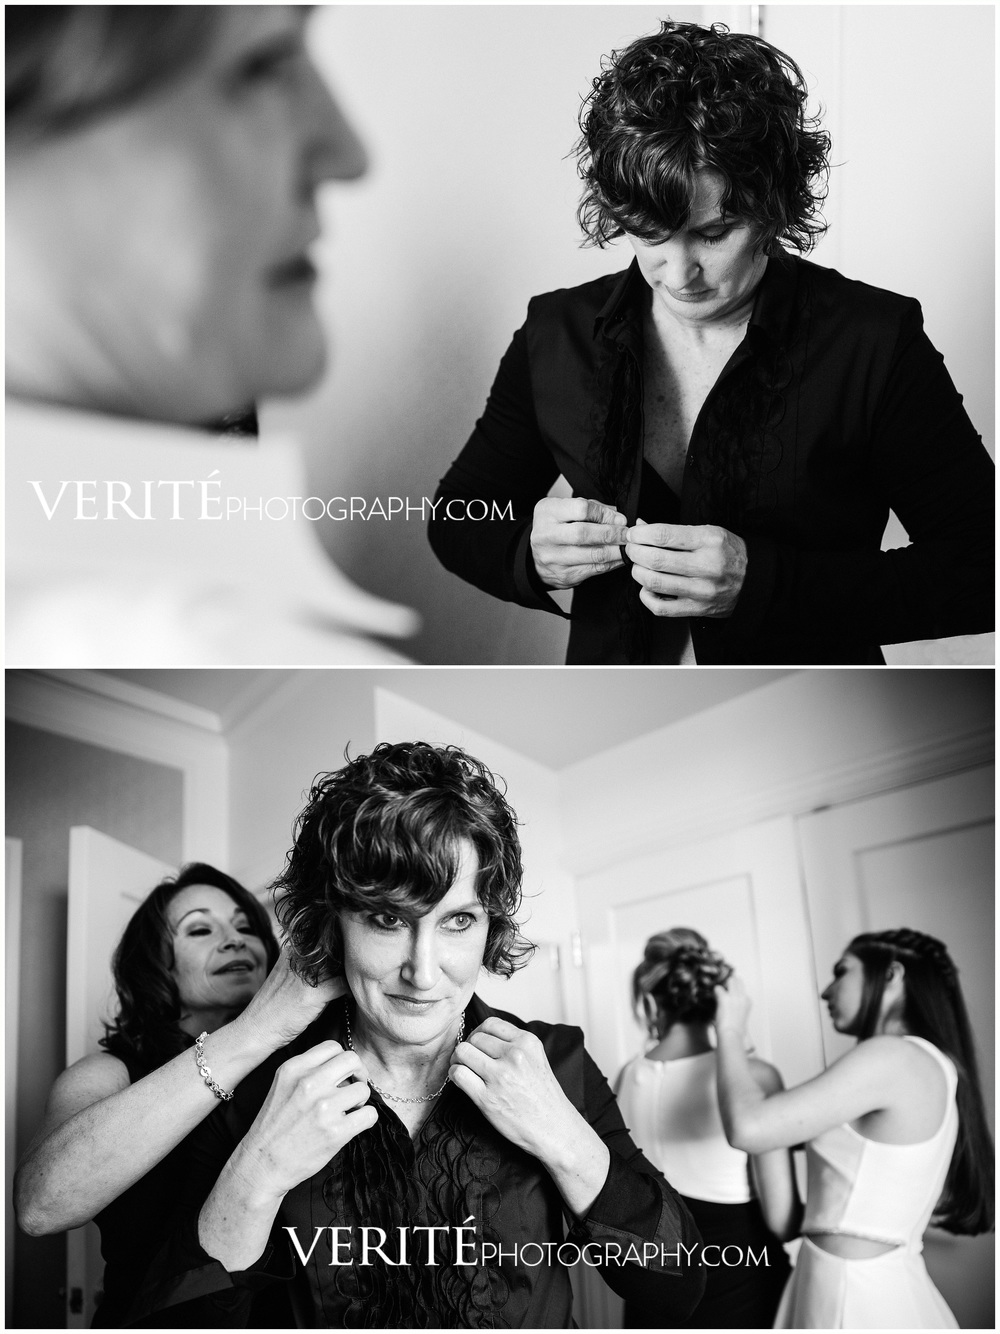 SusMich 2015 veritephotography 019.jpg